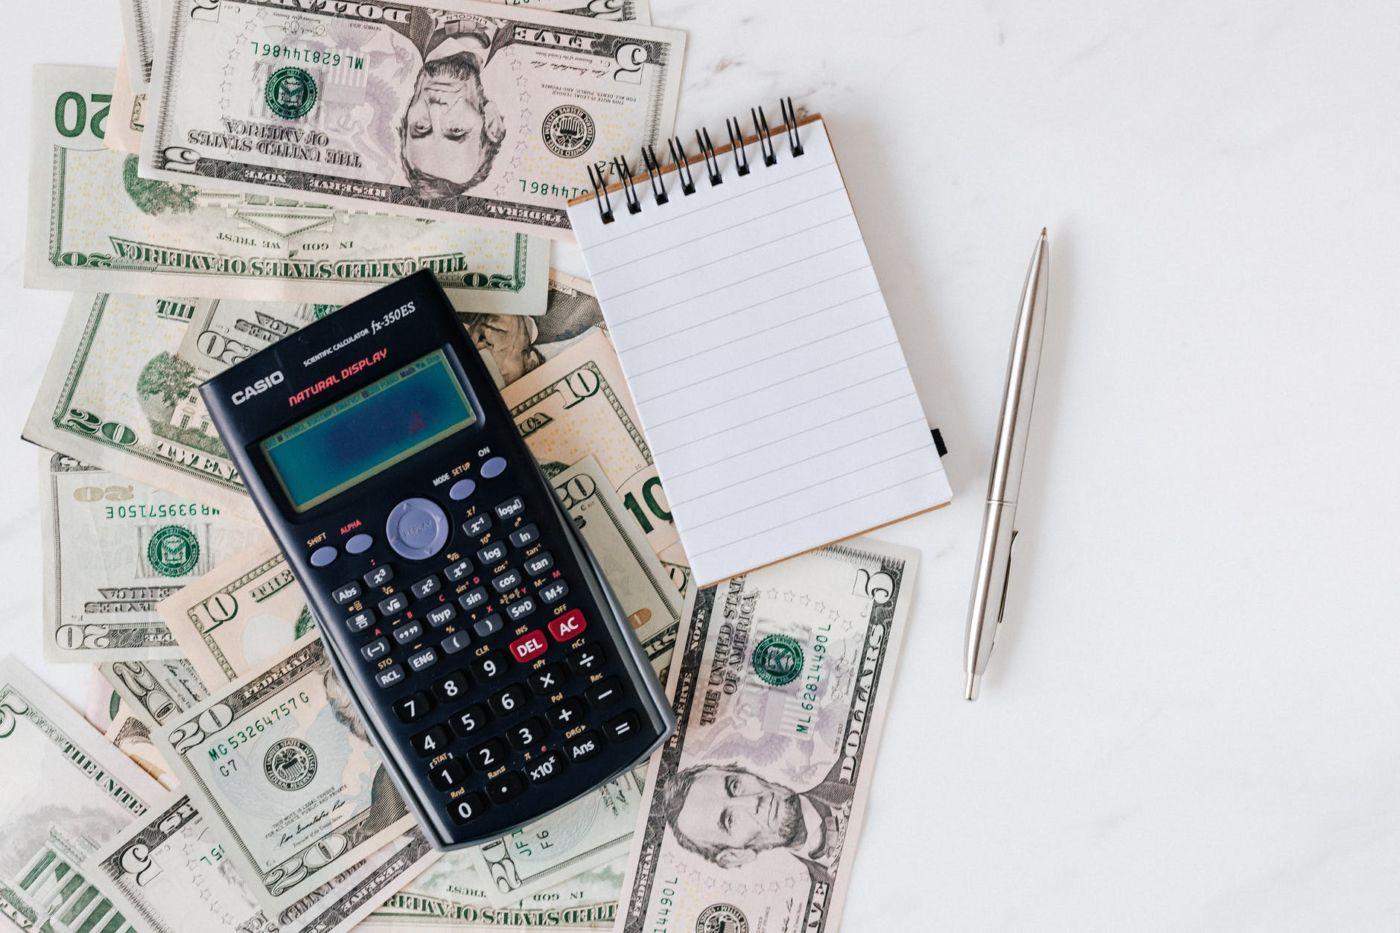 Plano Financeiro - Auster Inteligência Contábil